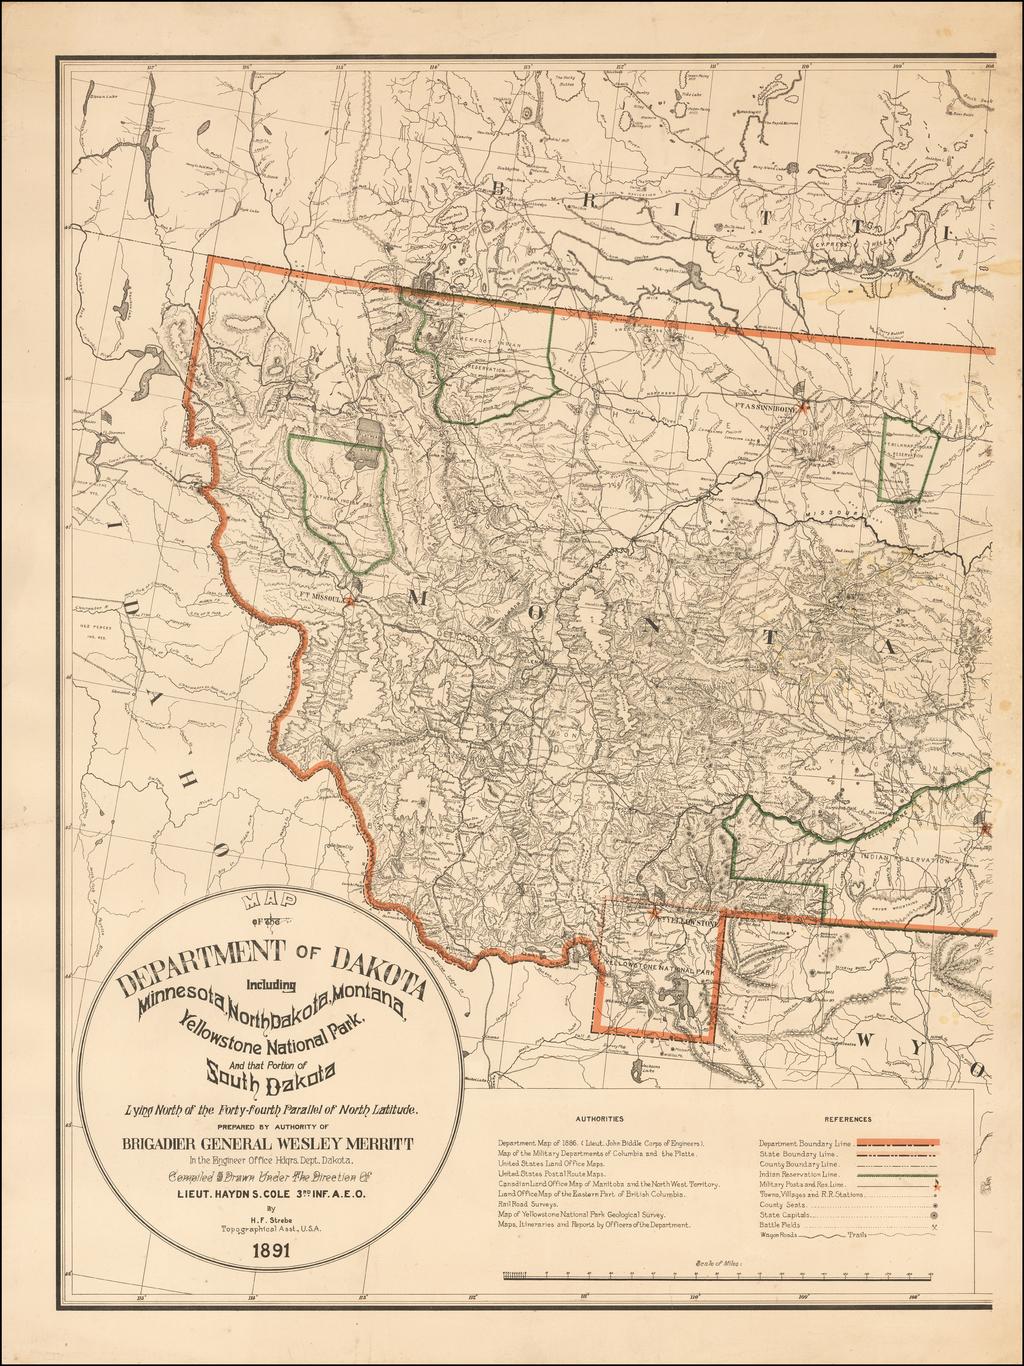 Montana Sheet] Map of the Department of Dakota. Including ... on wyoming-montana map south dakota, map of north and south dakota, map of idaho montana north dakota,